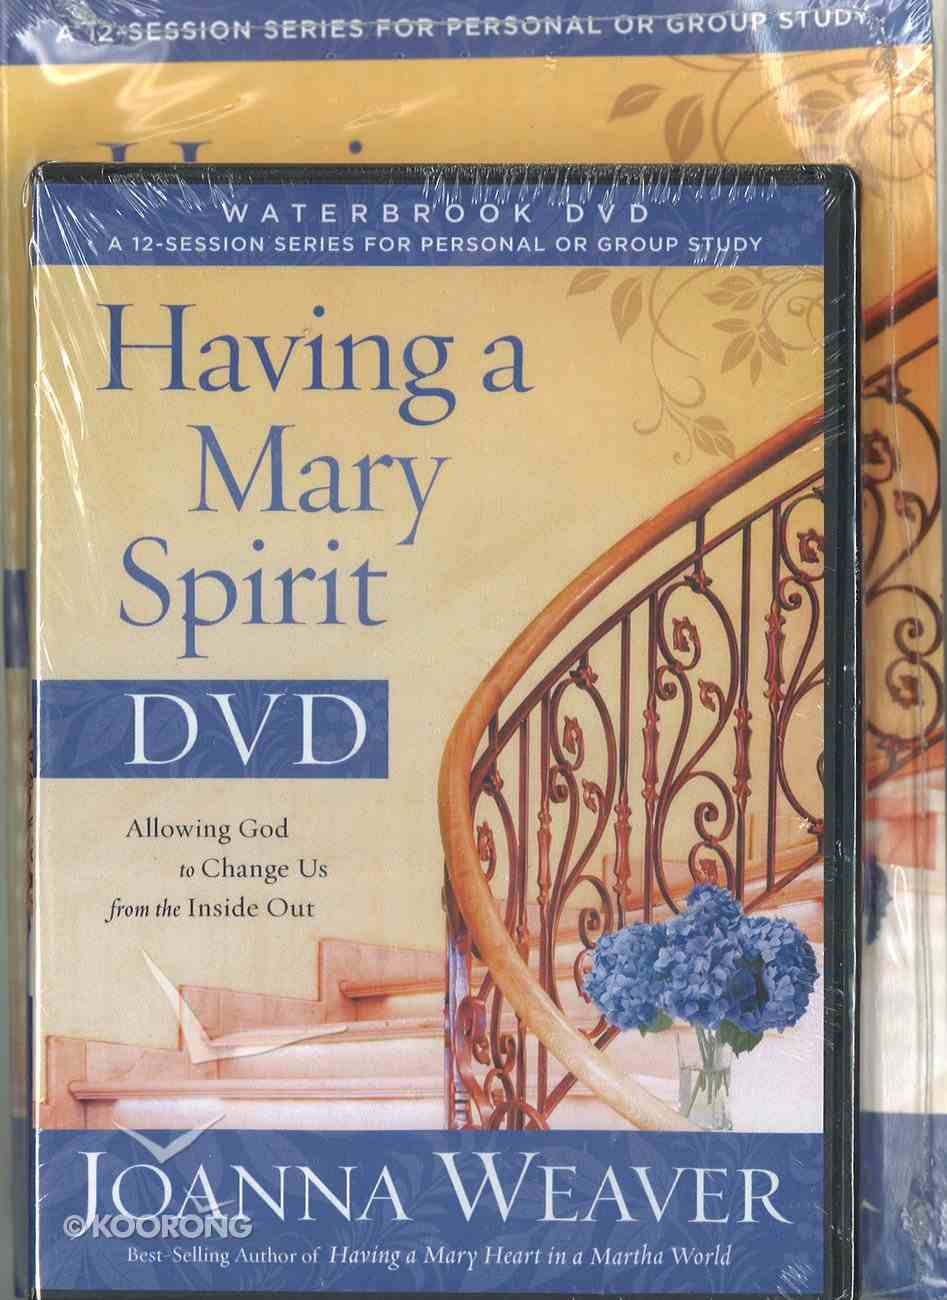 Having a Mary Spirit (Dvd Study Pack) Pack